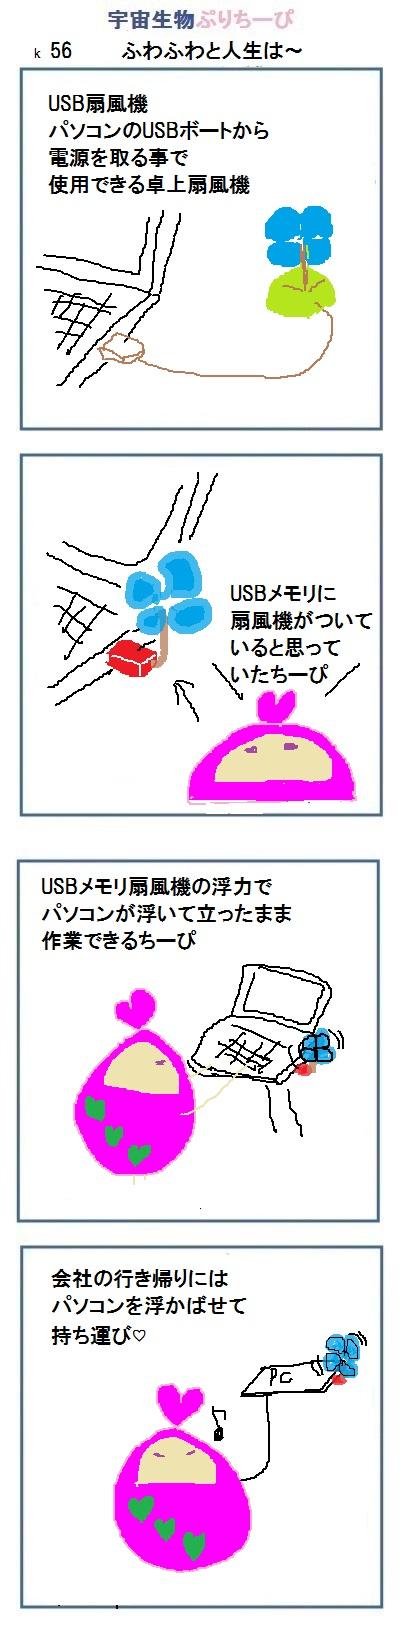 160729_kinsei56.jpg